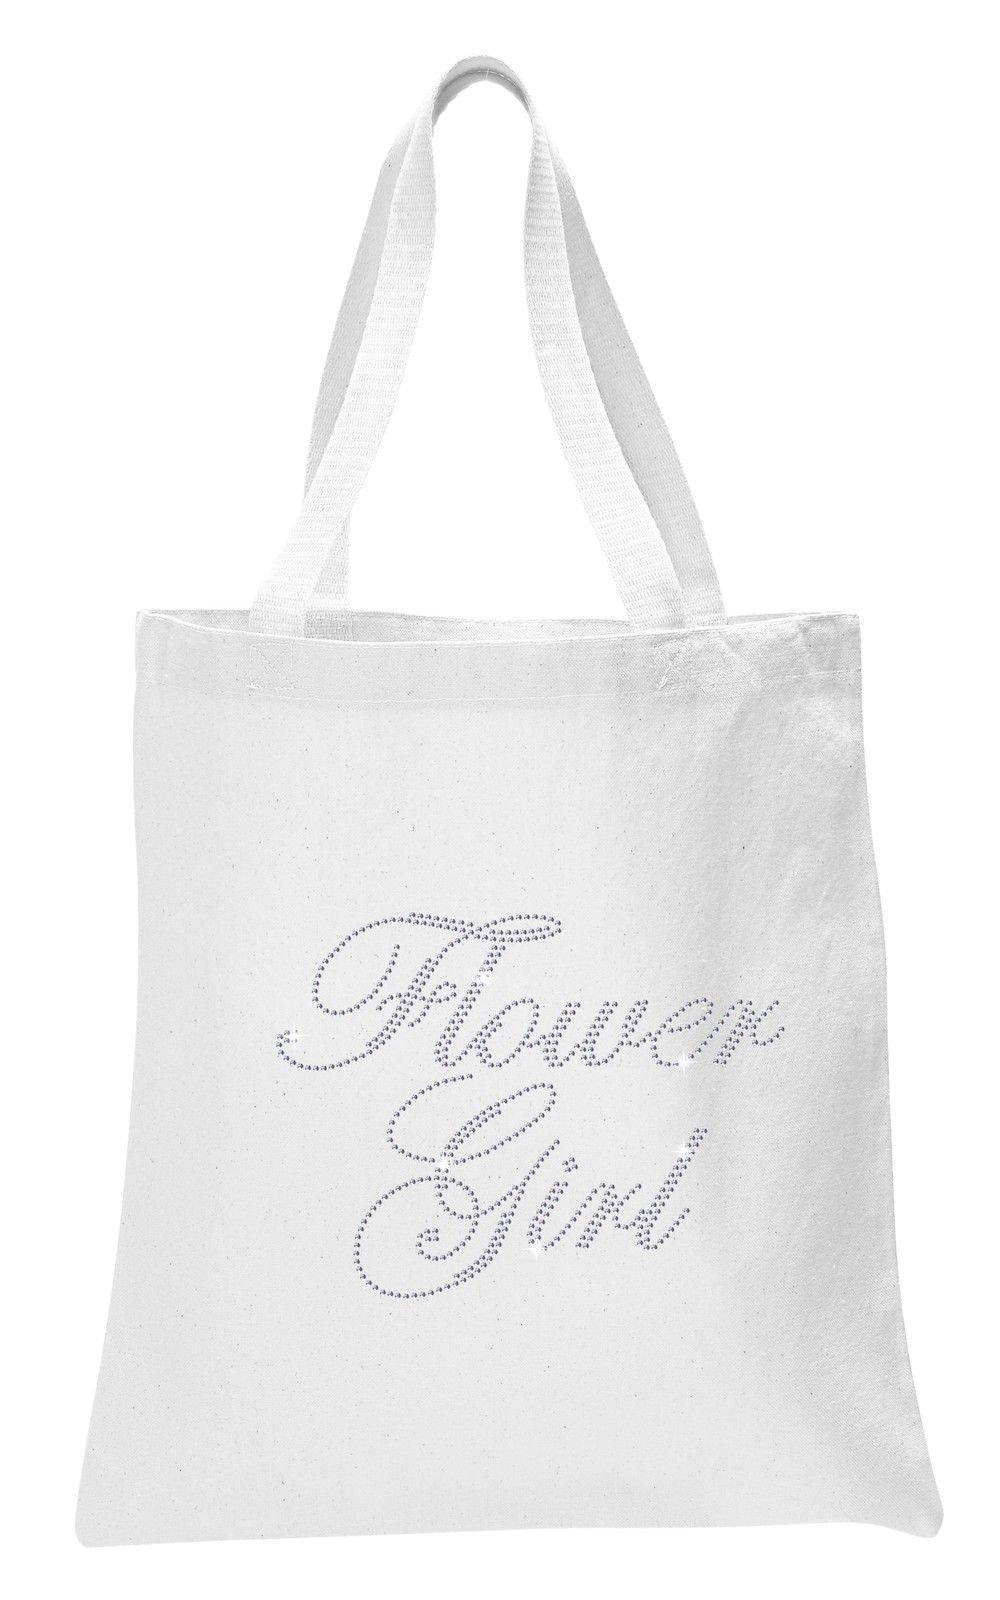 Varsany White Flower Girl Luxury Crystal Bride Tote bag wedding party gift bag Cotton